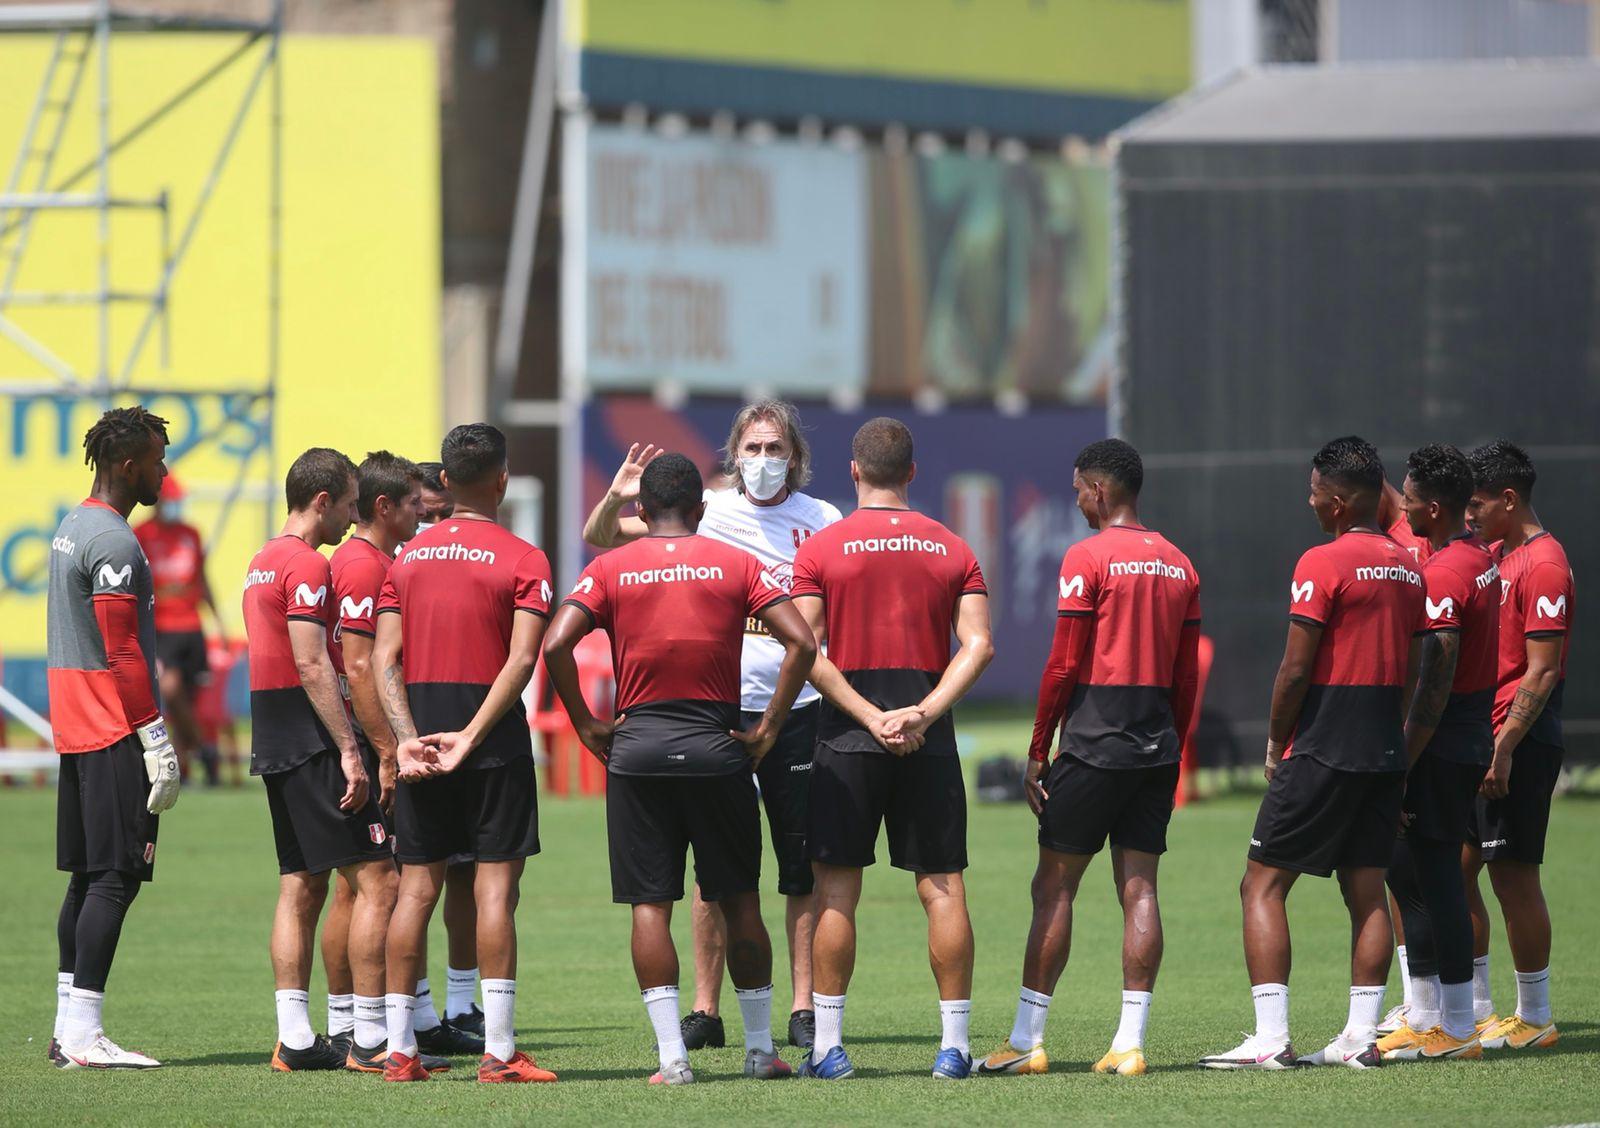 Selección Peruana tendría dos bajas por medidas en país europeo